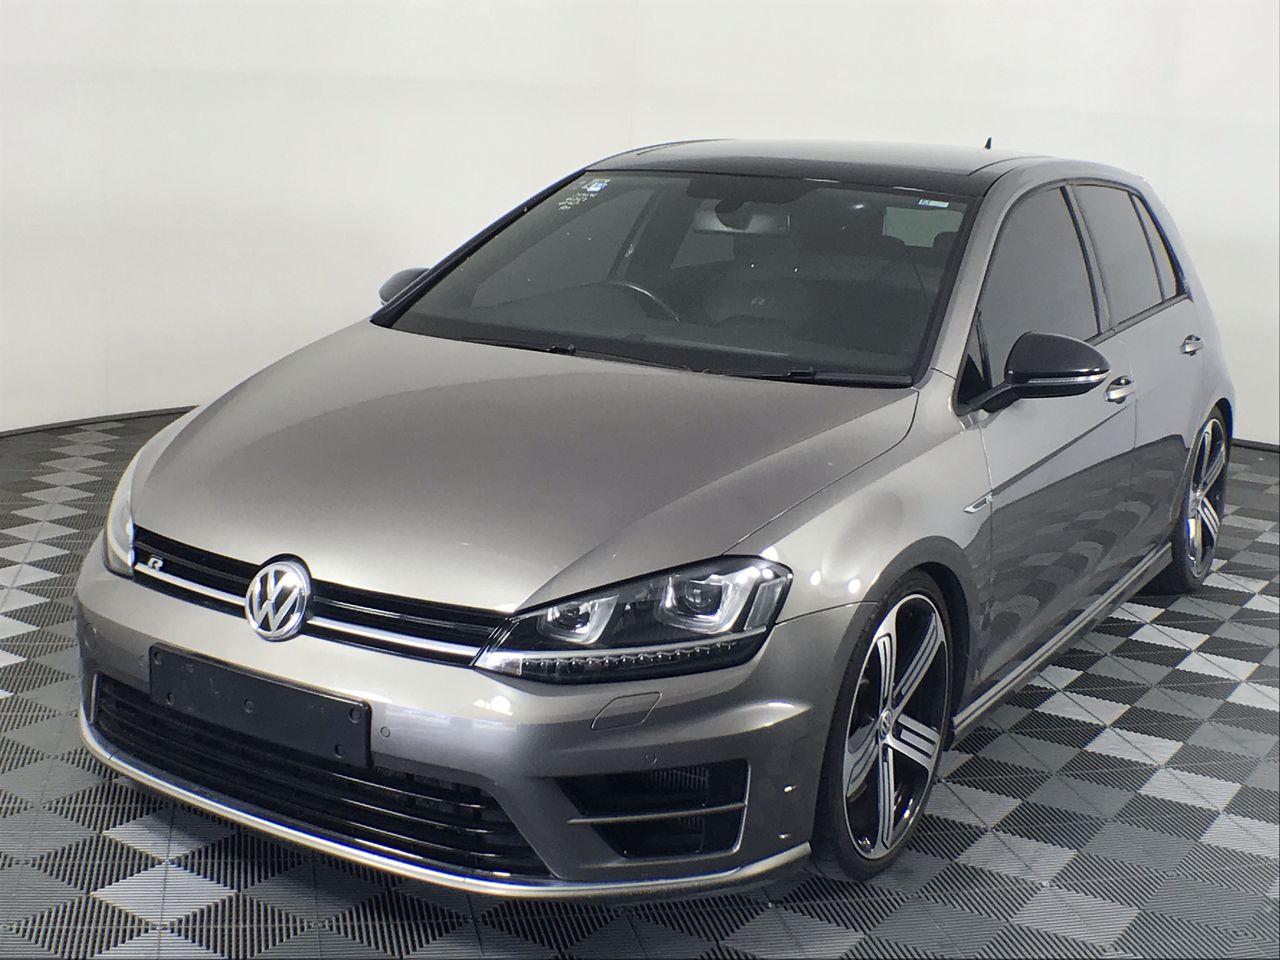 2014 Volkswagen Golf R A7 Automatic Hatchback 82,394km